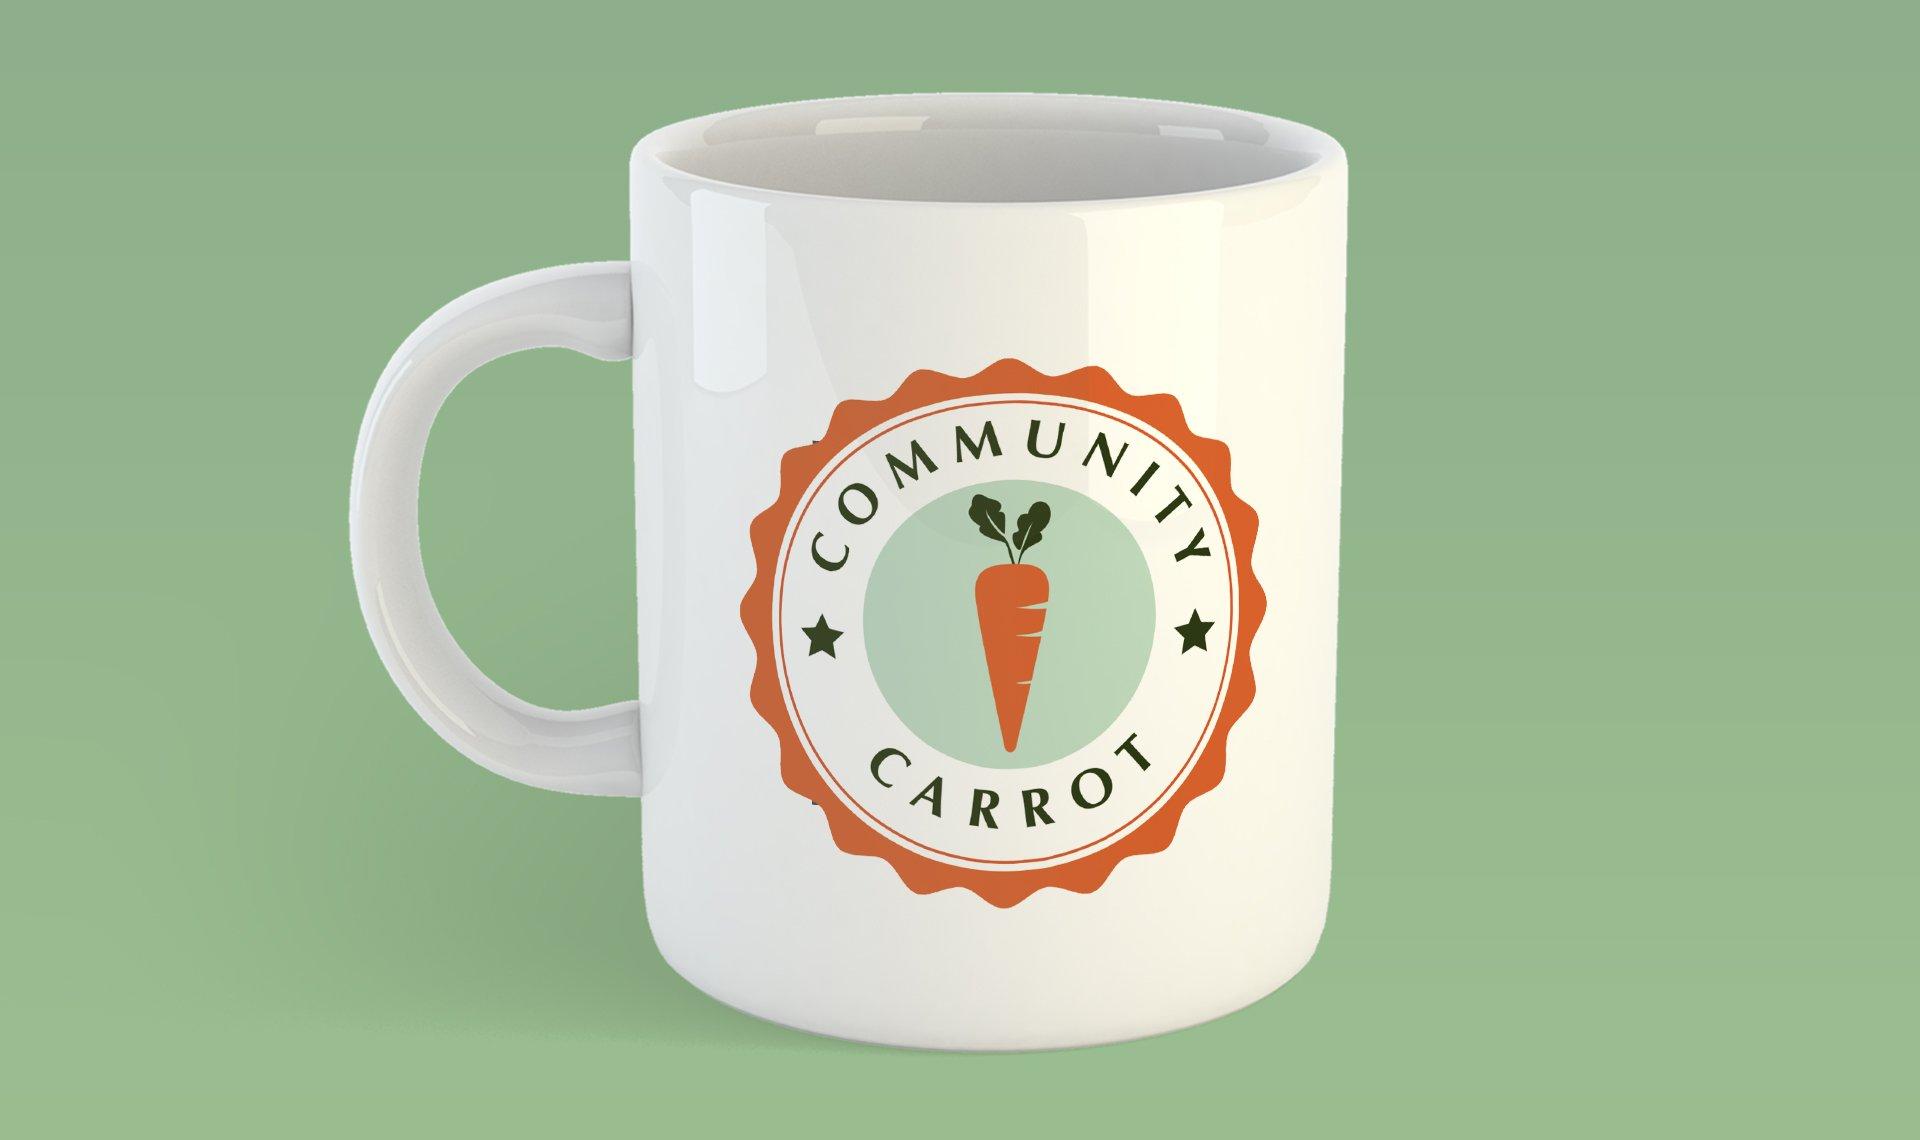 Community Carrot mug